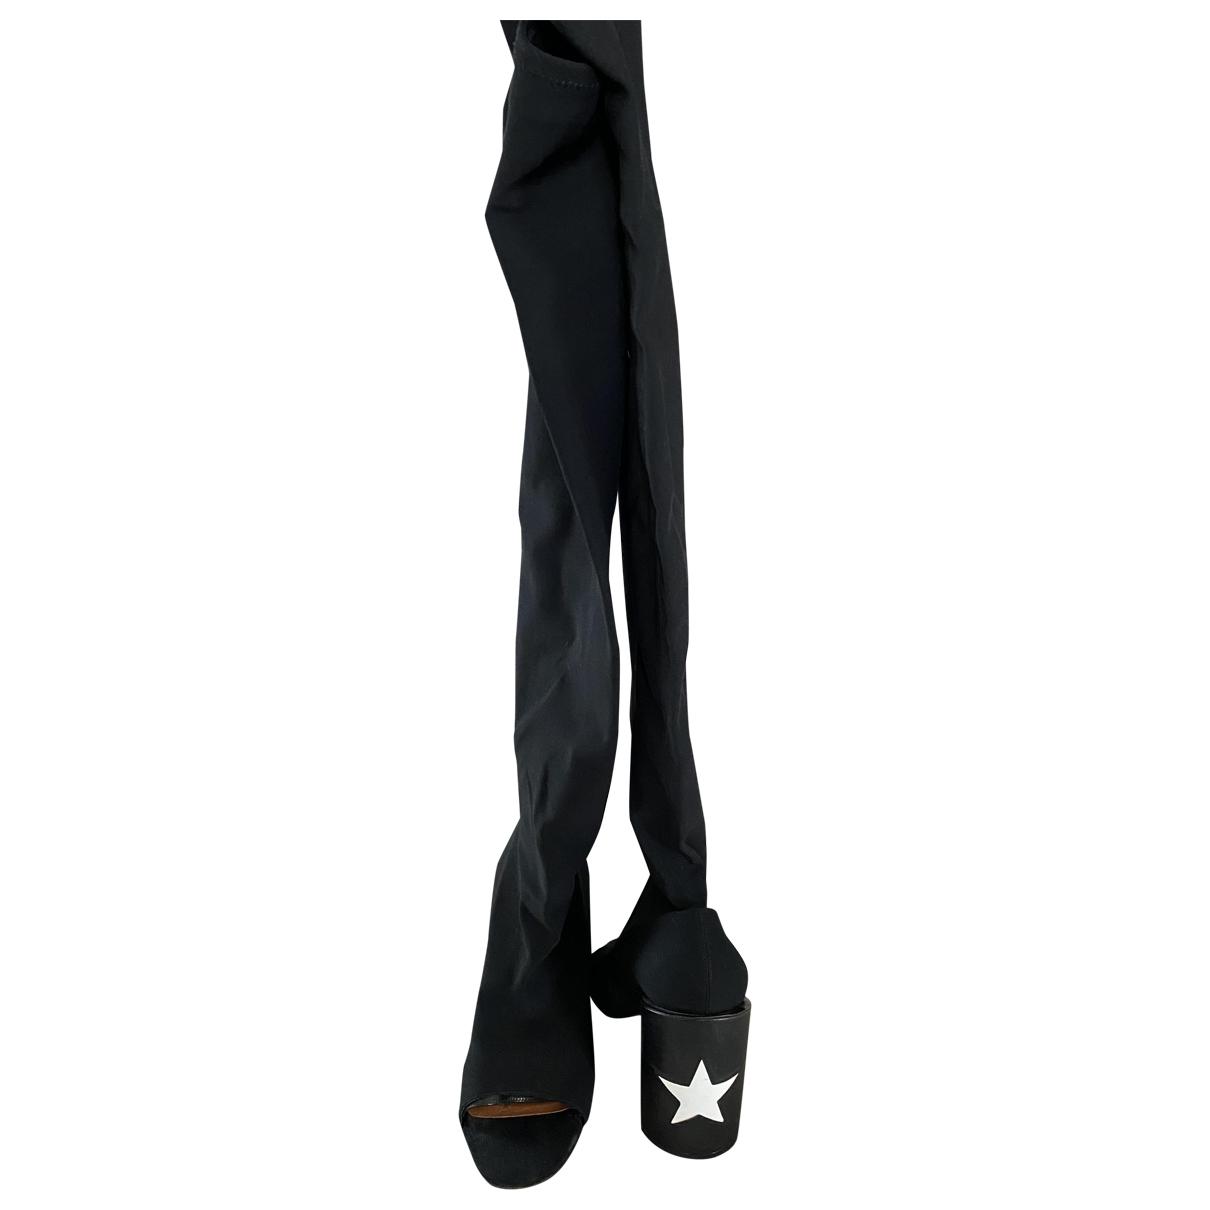 Botas de Lona Givenchy